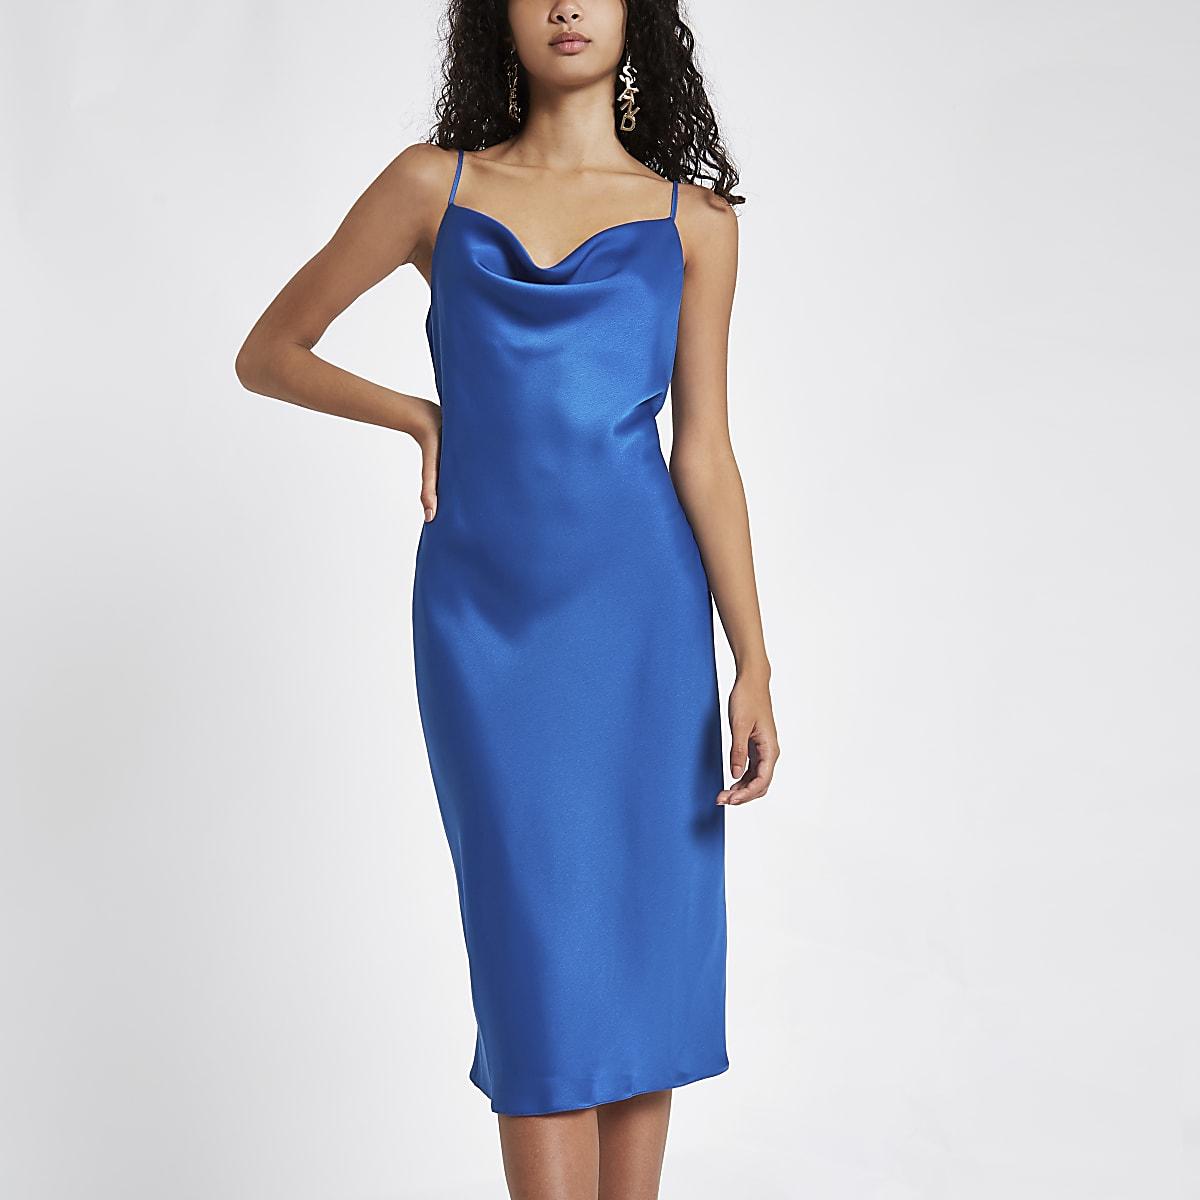 73bc8a331 Blue satin cowl neck slip dress - Slip & Cami Dresses - Dresses - women